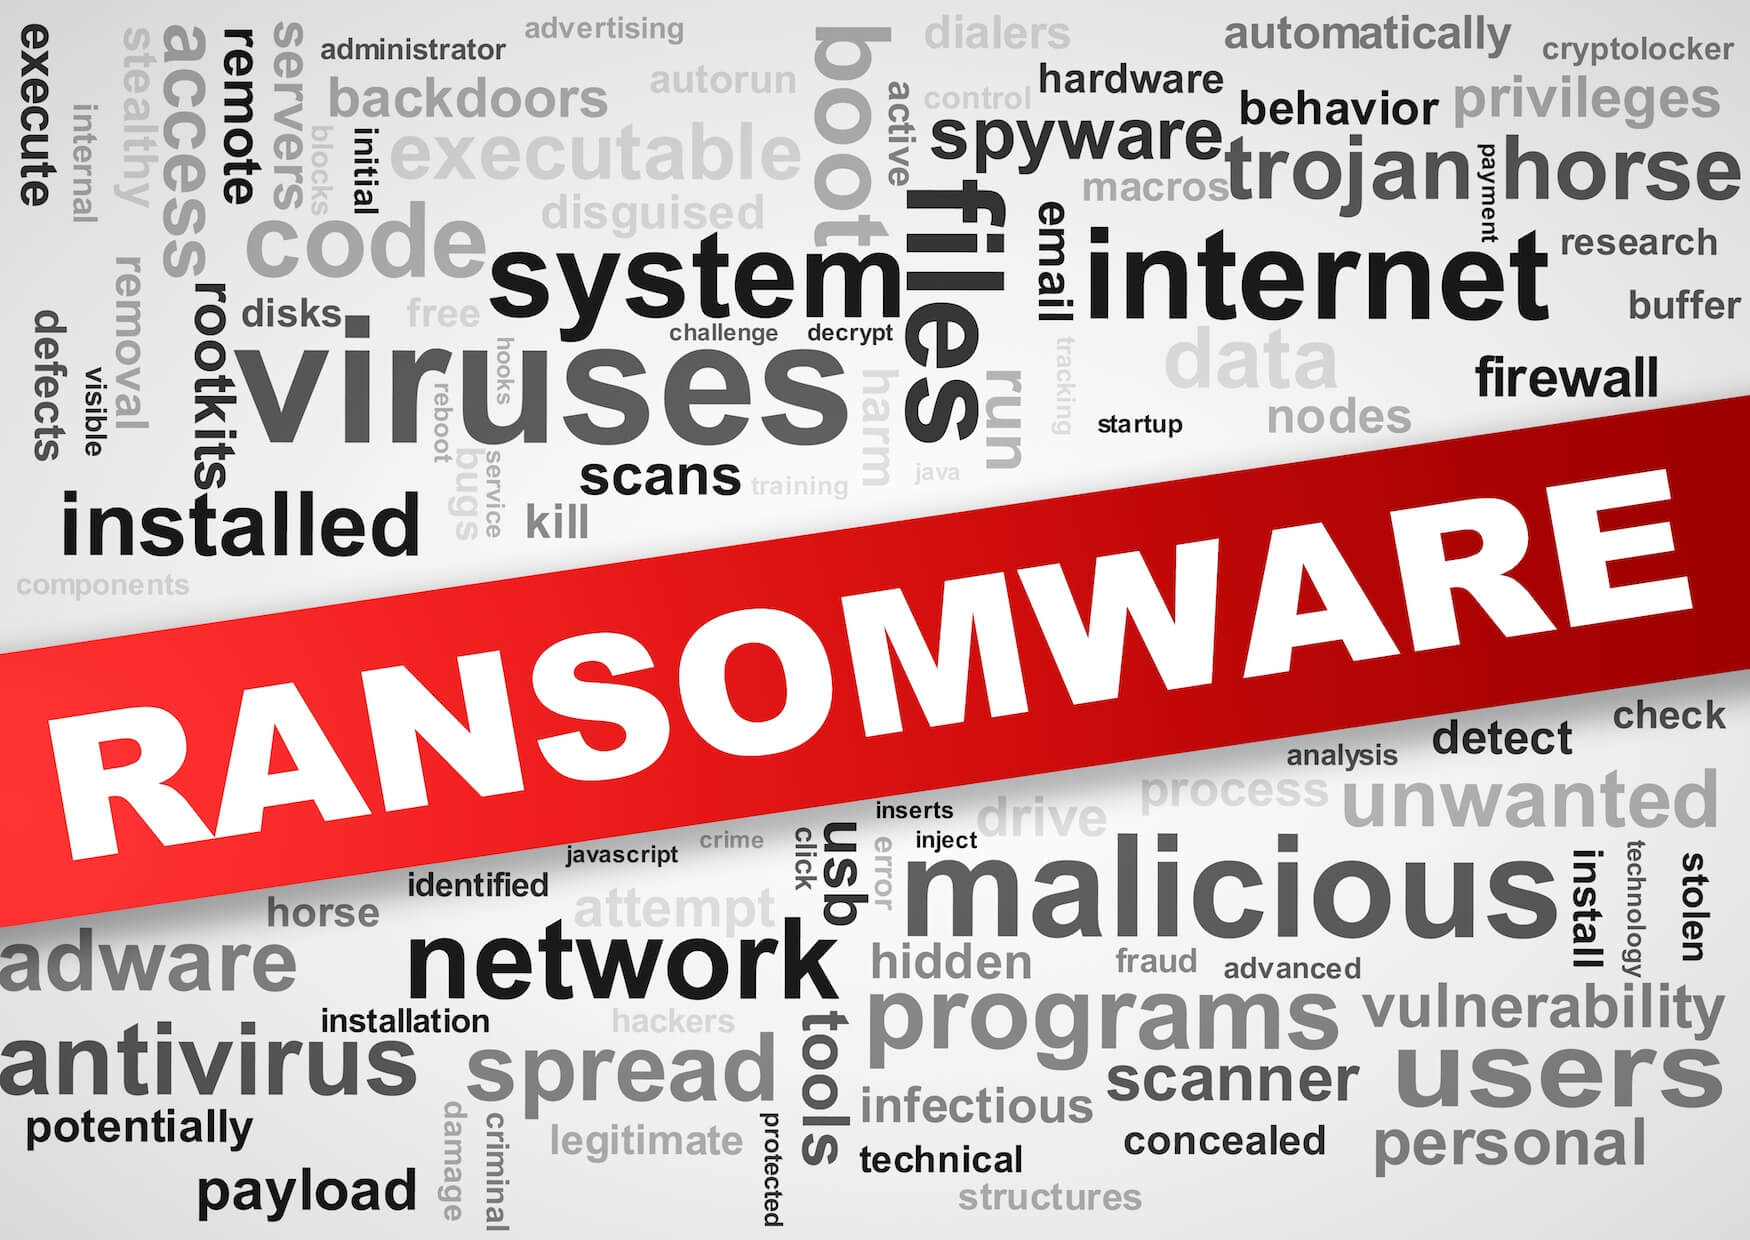 ransomware news copy.jpg